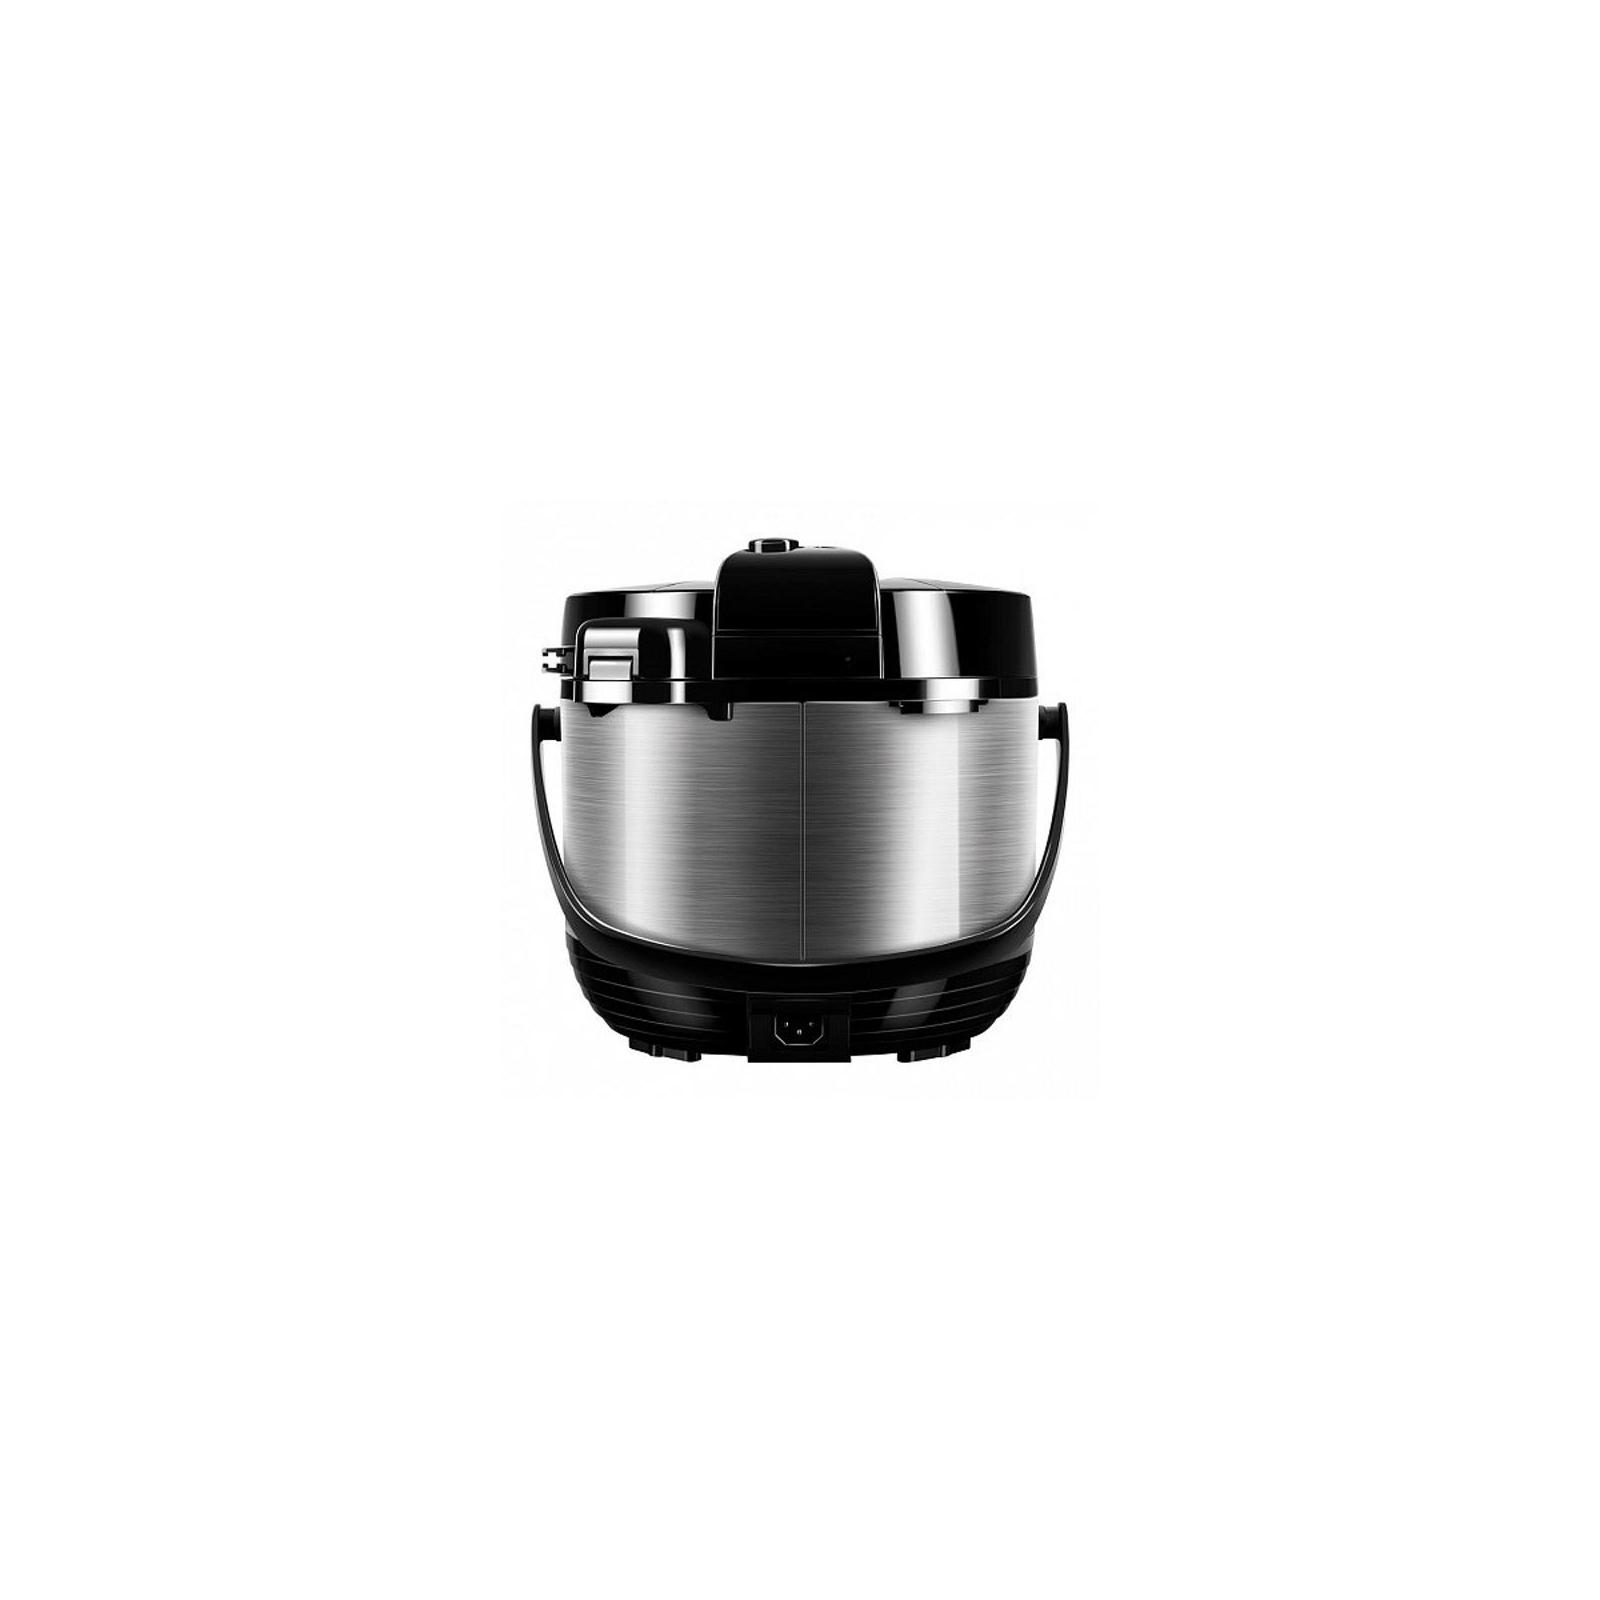 Мультиварка REDMOND RMC-PM400 изображение 4